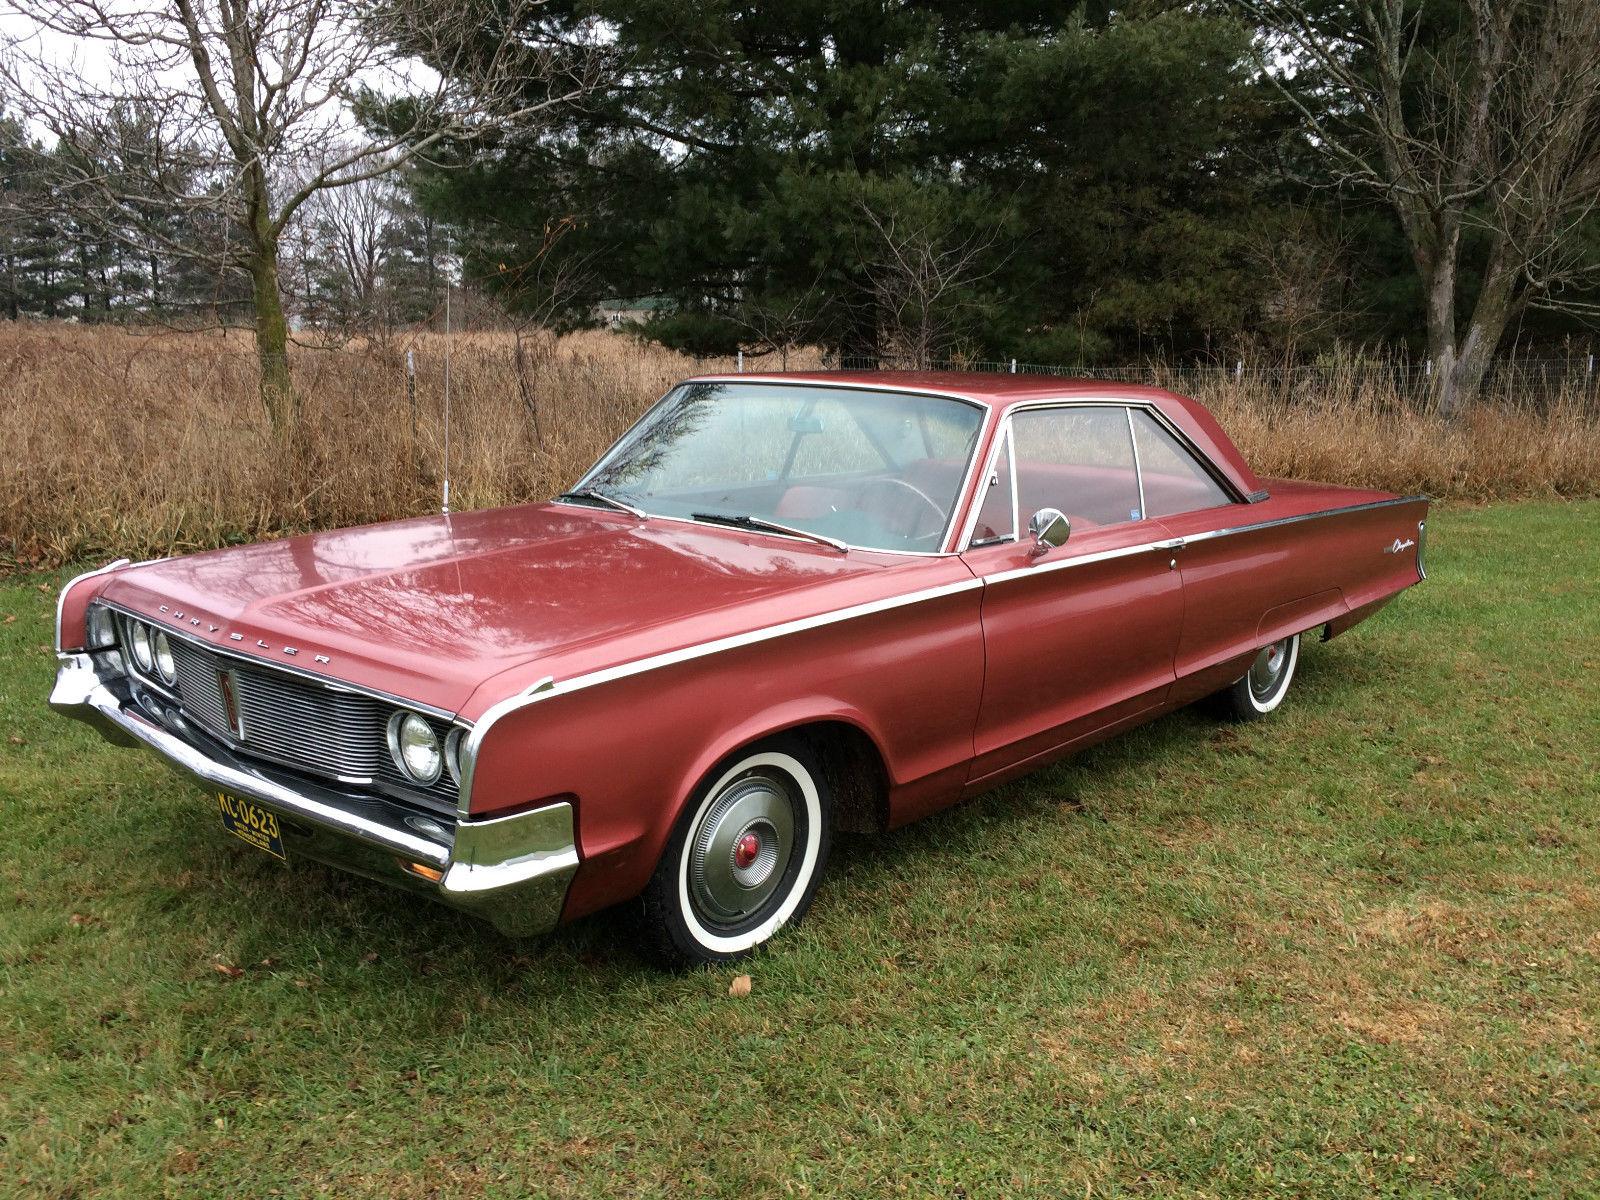 1965 Chrysler Newport 383 Mopar Classic Chrysler Newport